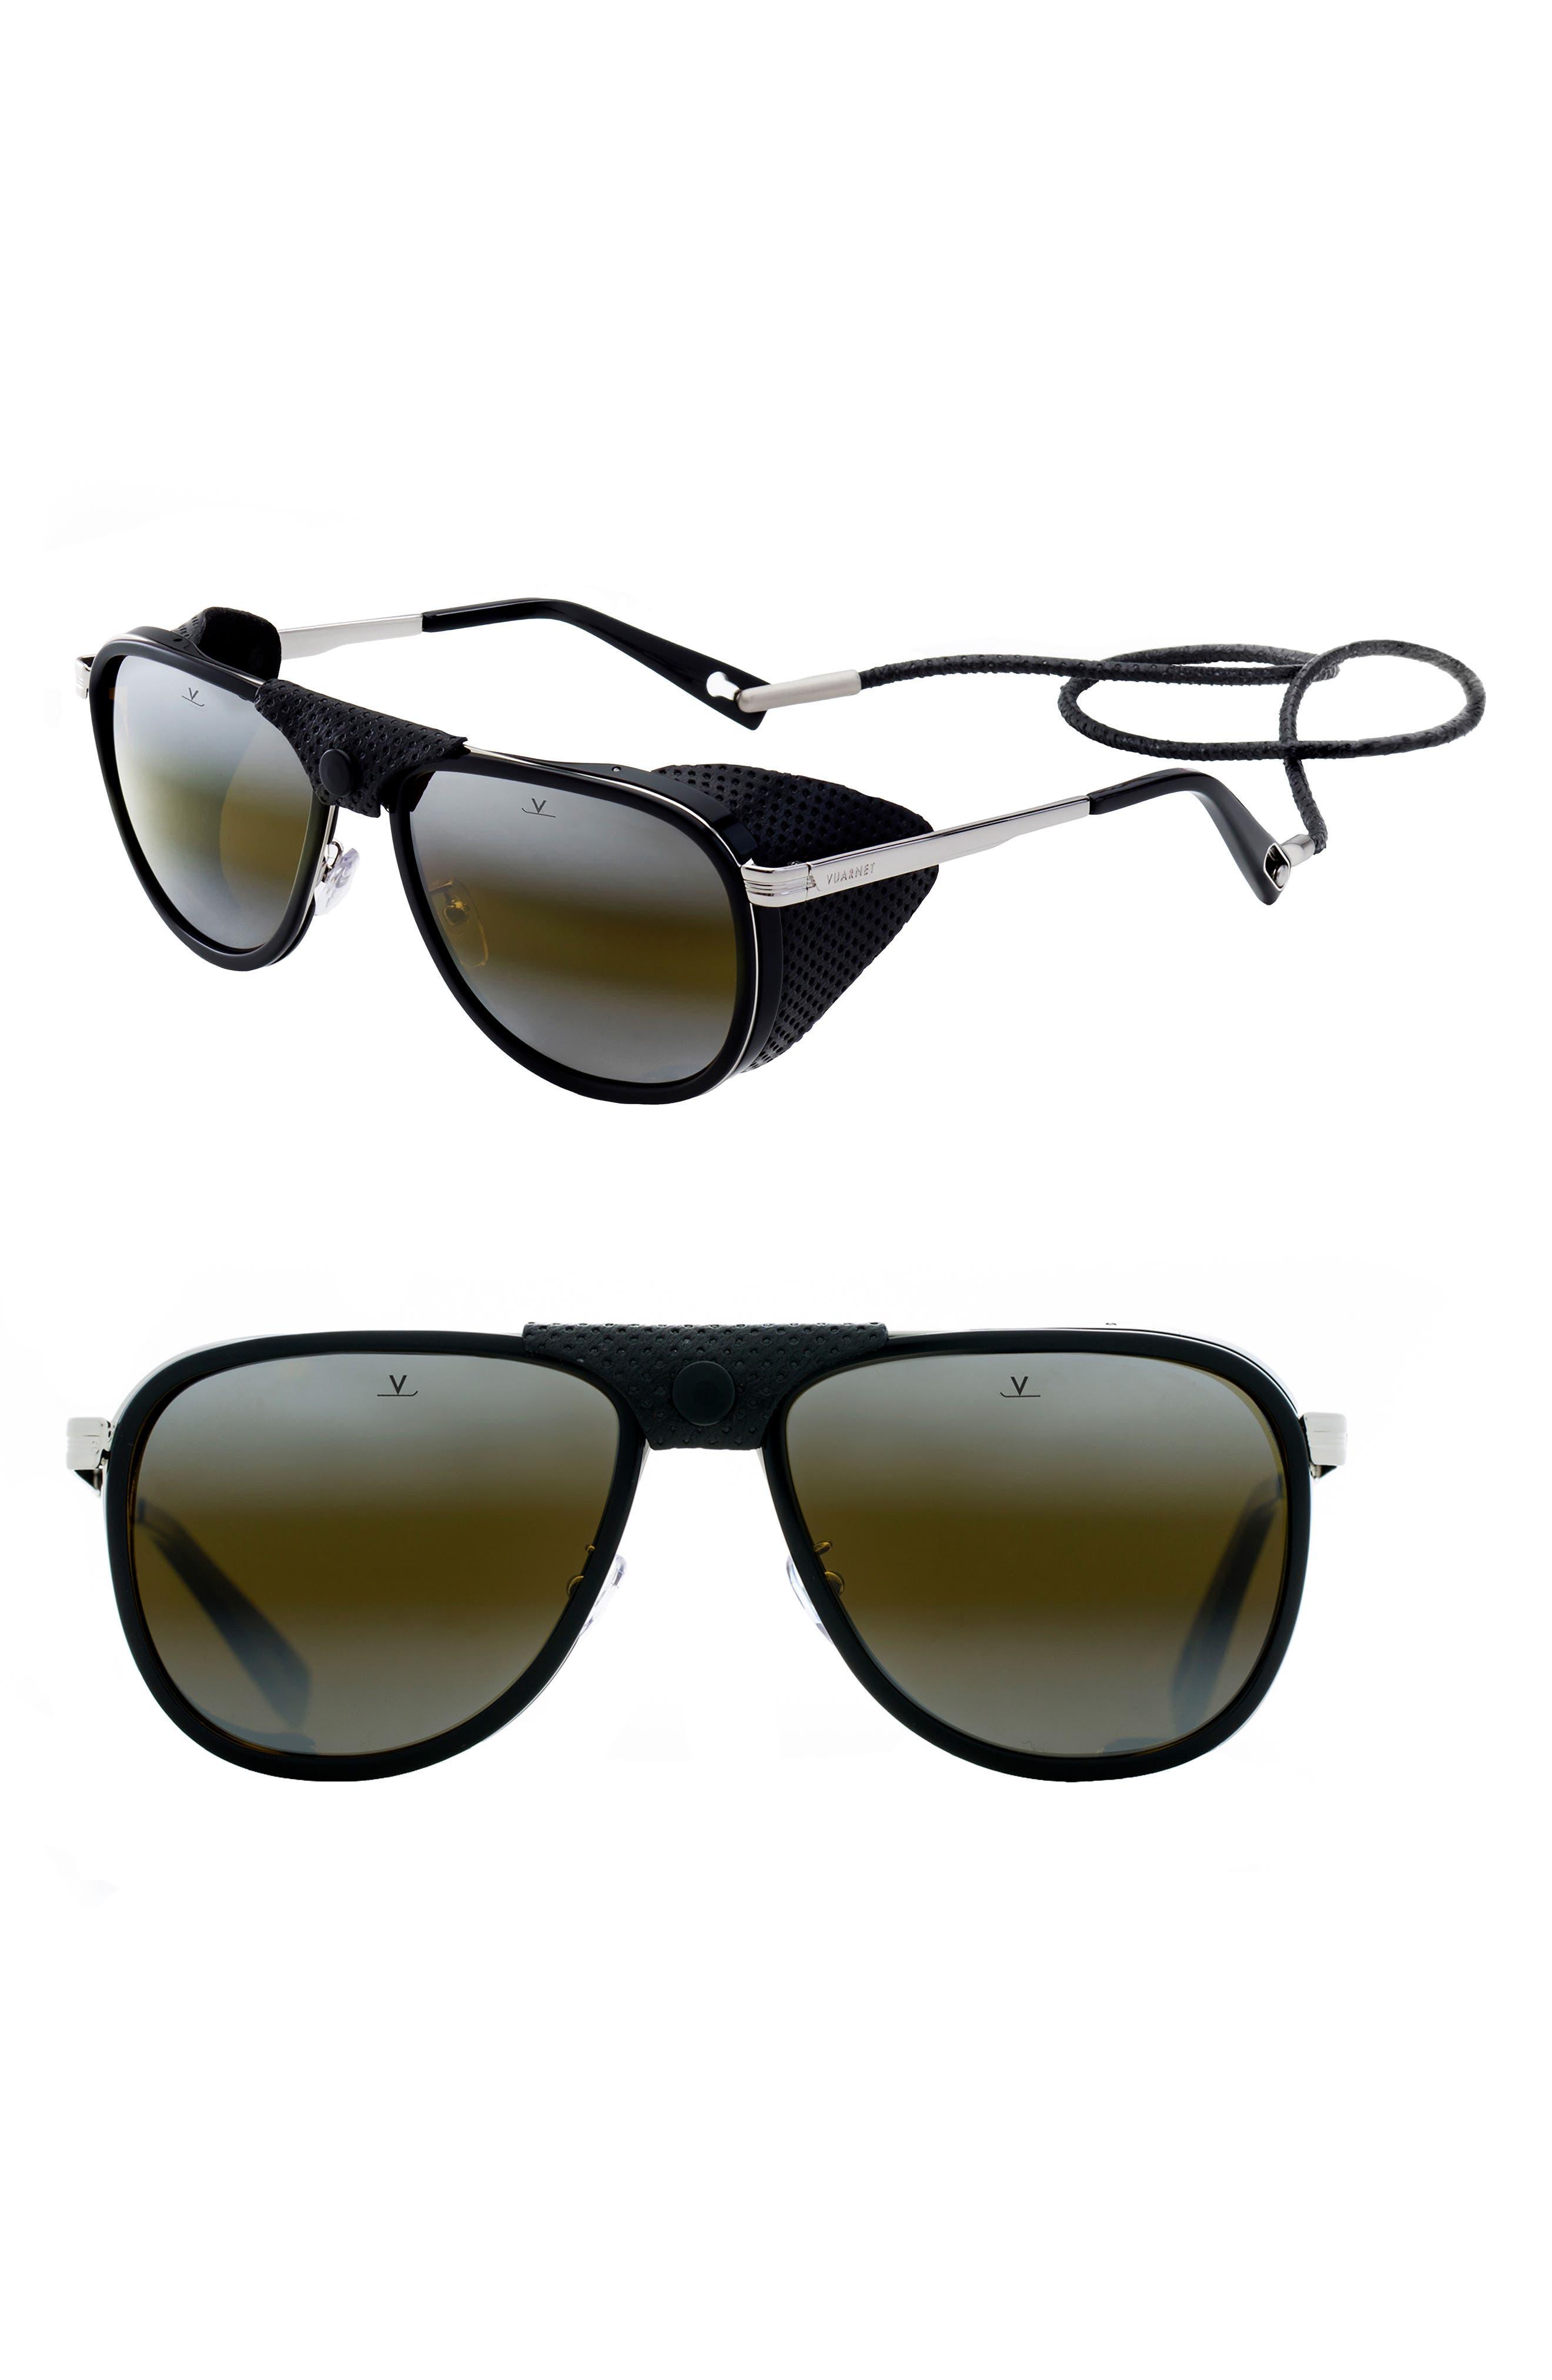 Glacier XL 61mm Polarized Sunglasses,                             Main thumbnail 1, color,                             BLACK/ SILVER/ BLACK